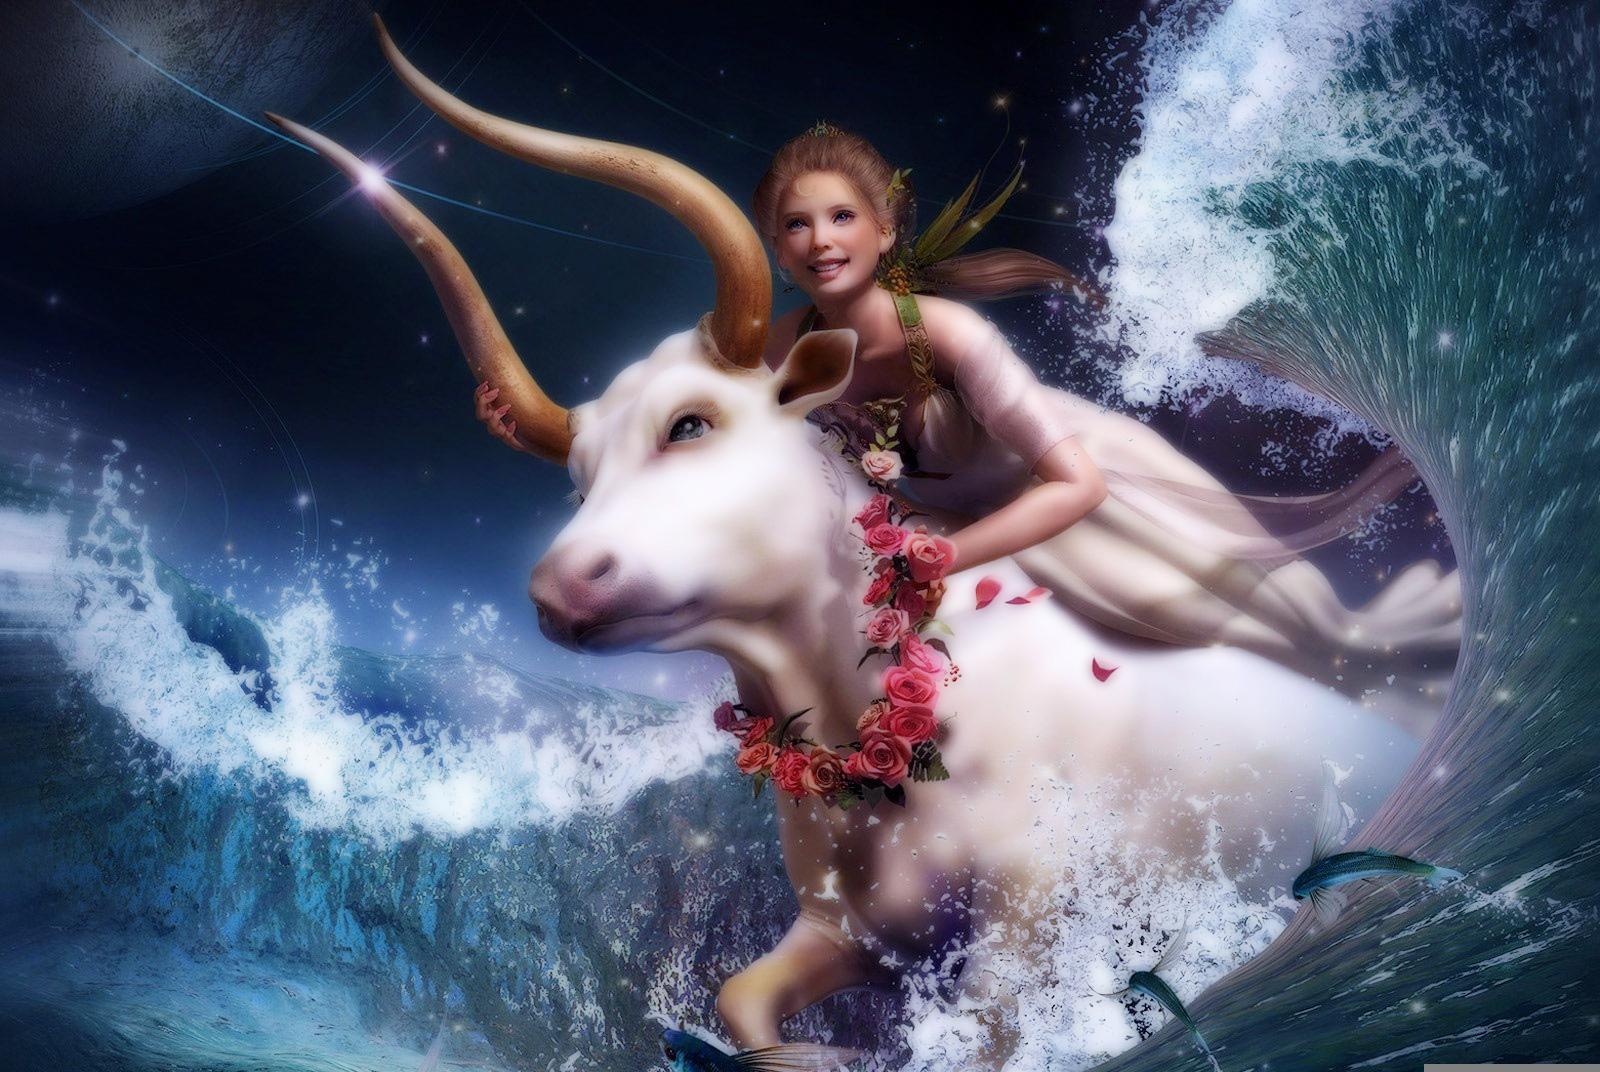 Hintergrundbilder Kostenlos Fantasy - Hintergrundbilder Fantom XP